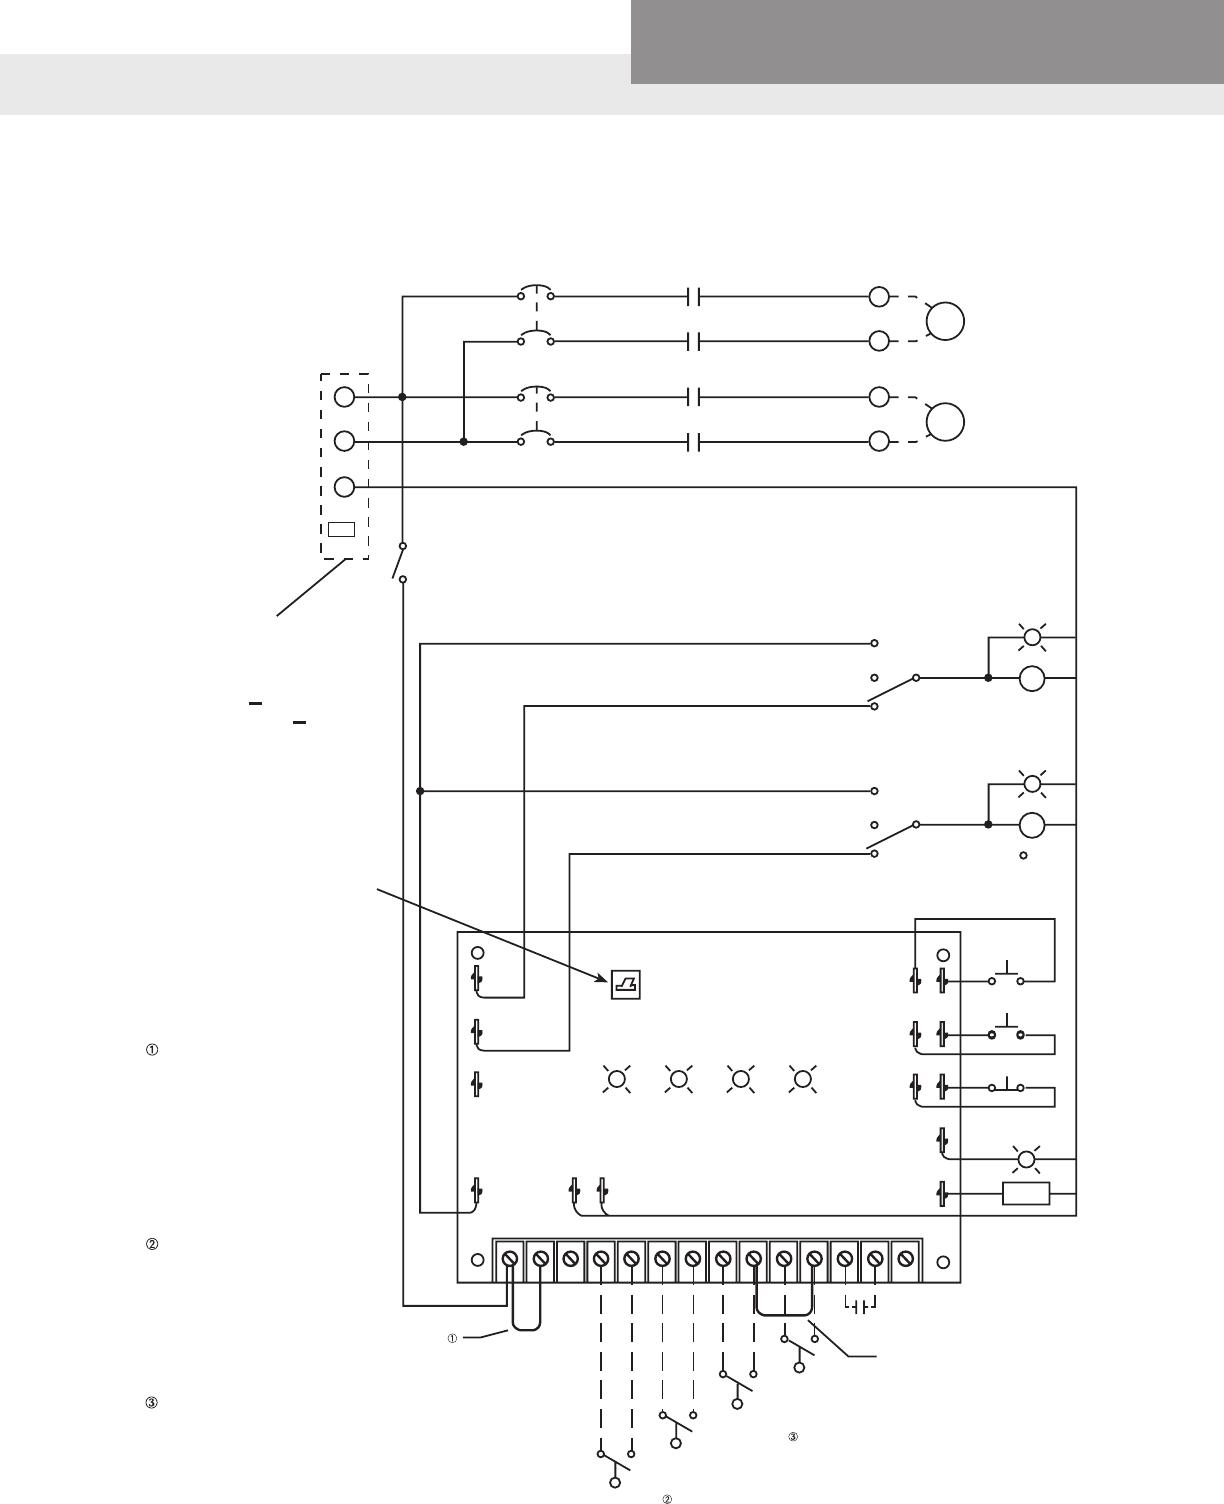 540223 2 Centripro Ses D10020 D32232 Duplex Control Panel Technical Lead Lag Wiring Diagram Page 5